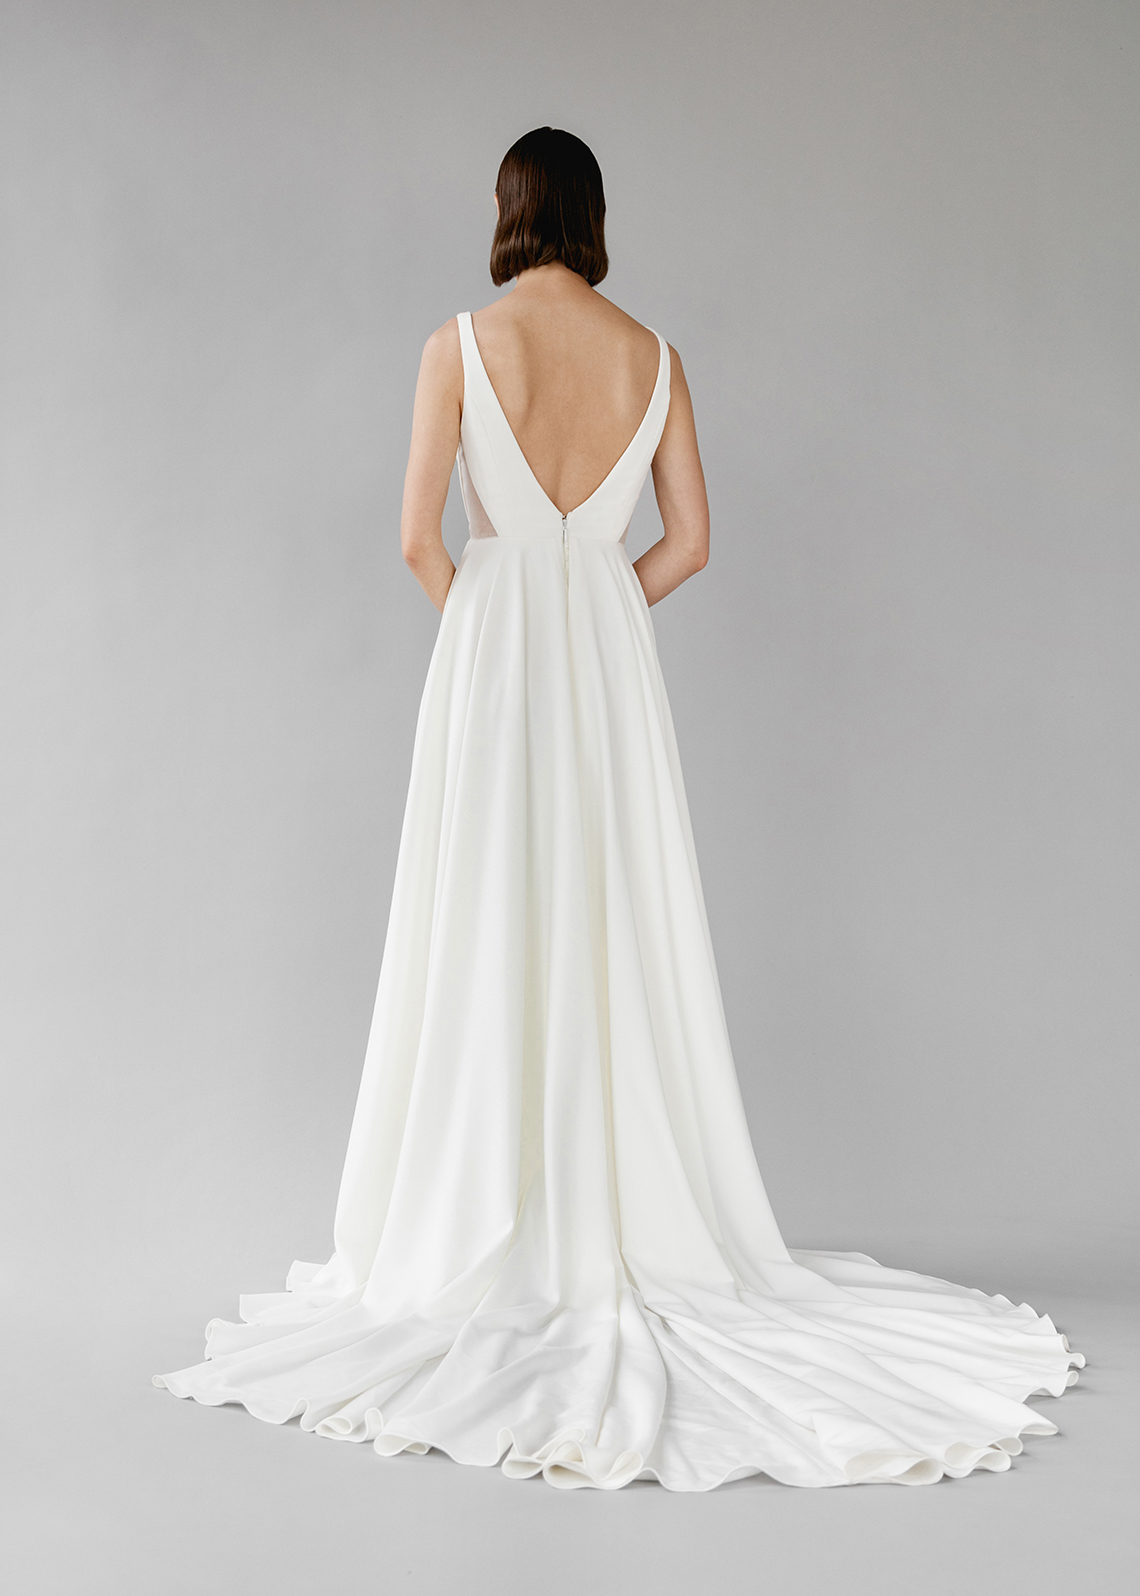 Modern Minimalist 2021 Wedding Dresses by Aesling Bride – Aurora Dress 4